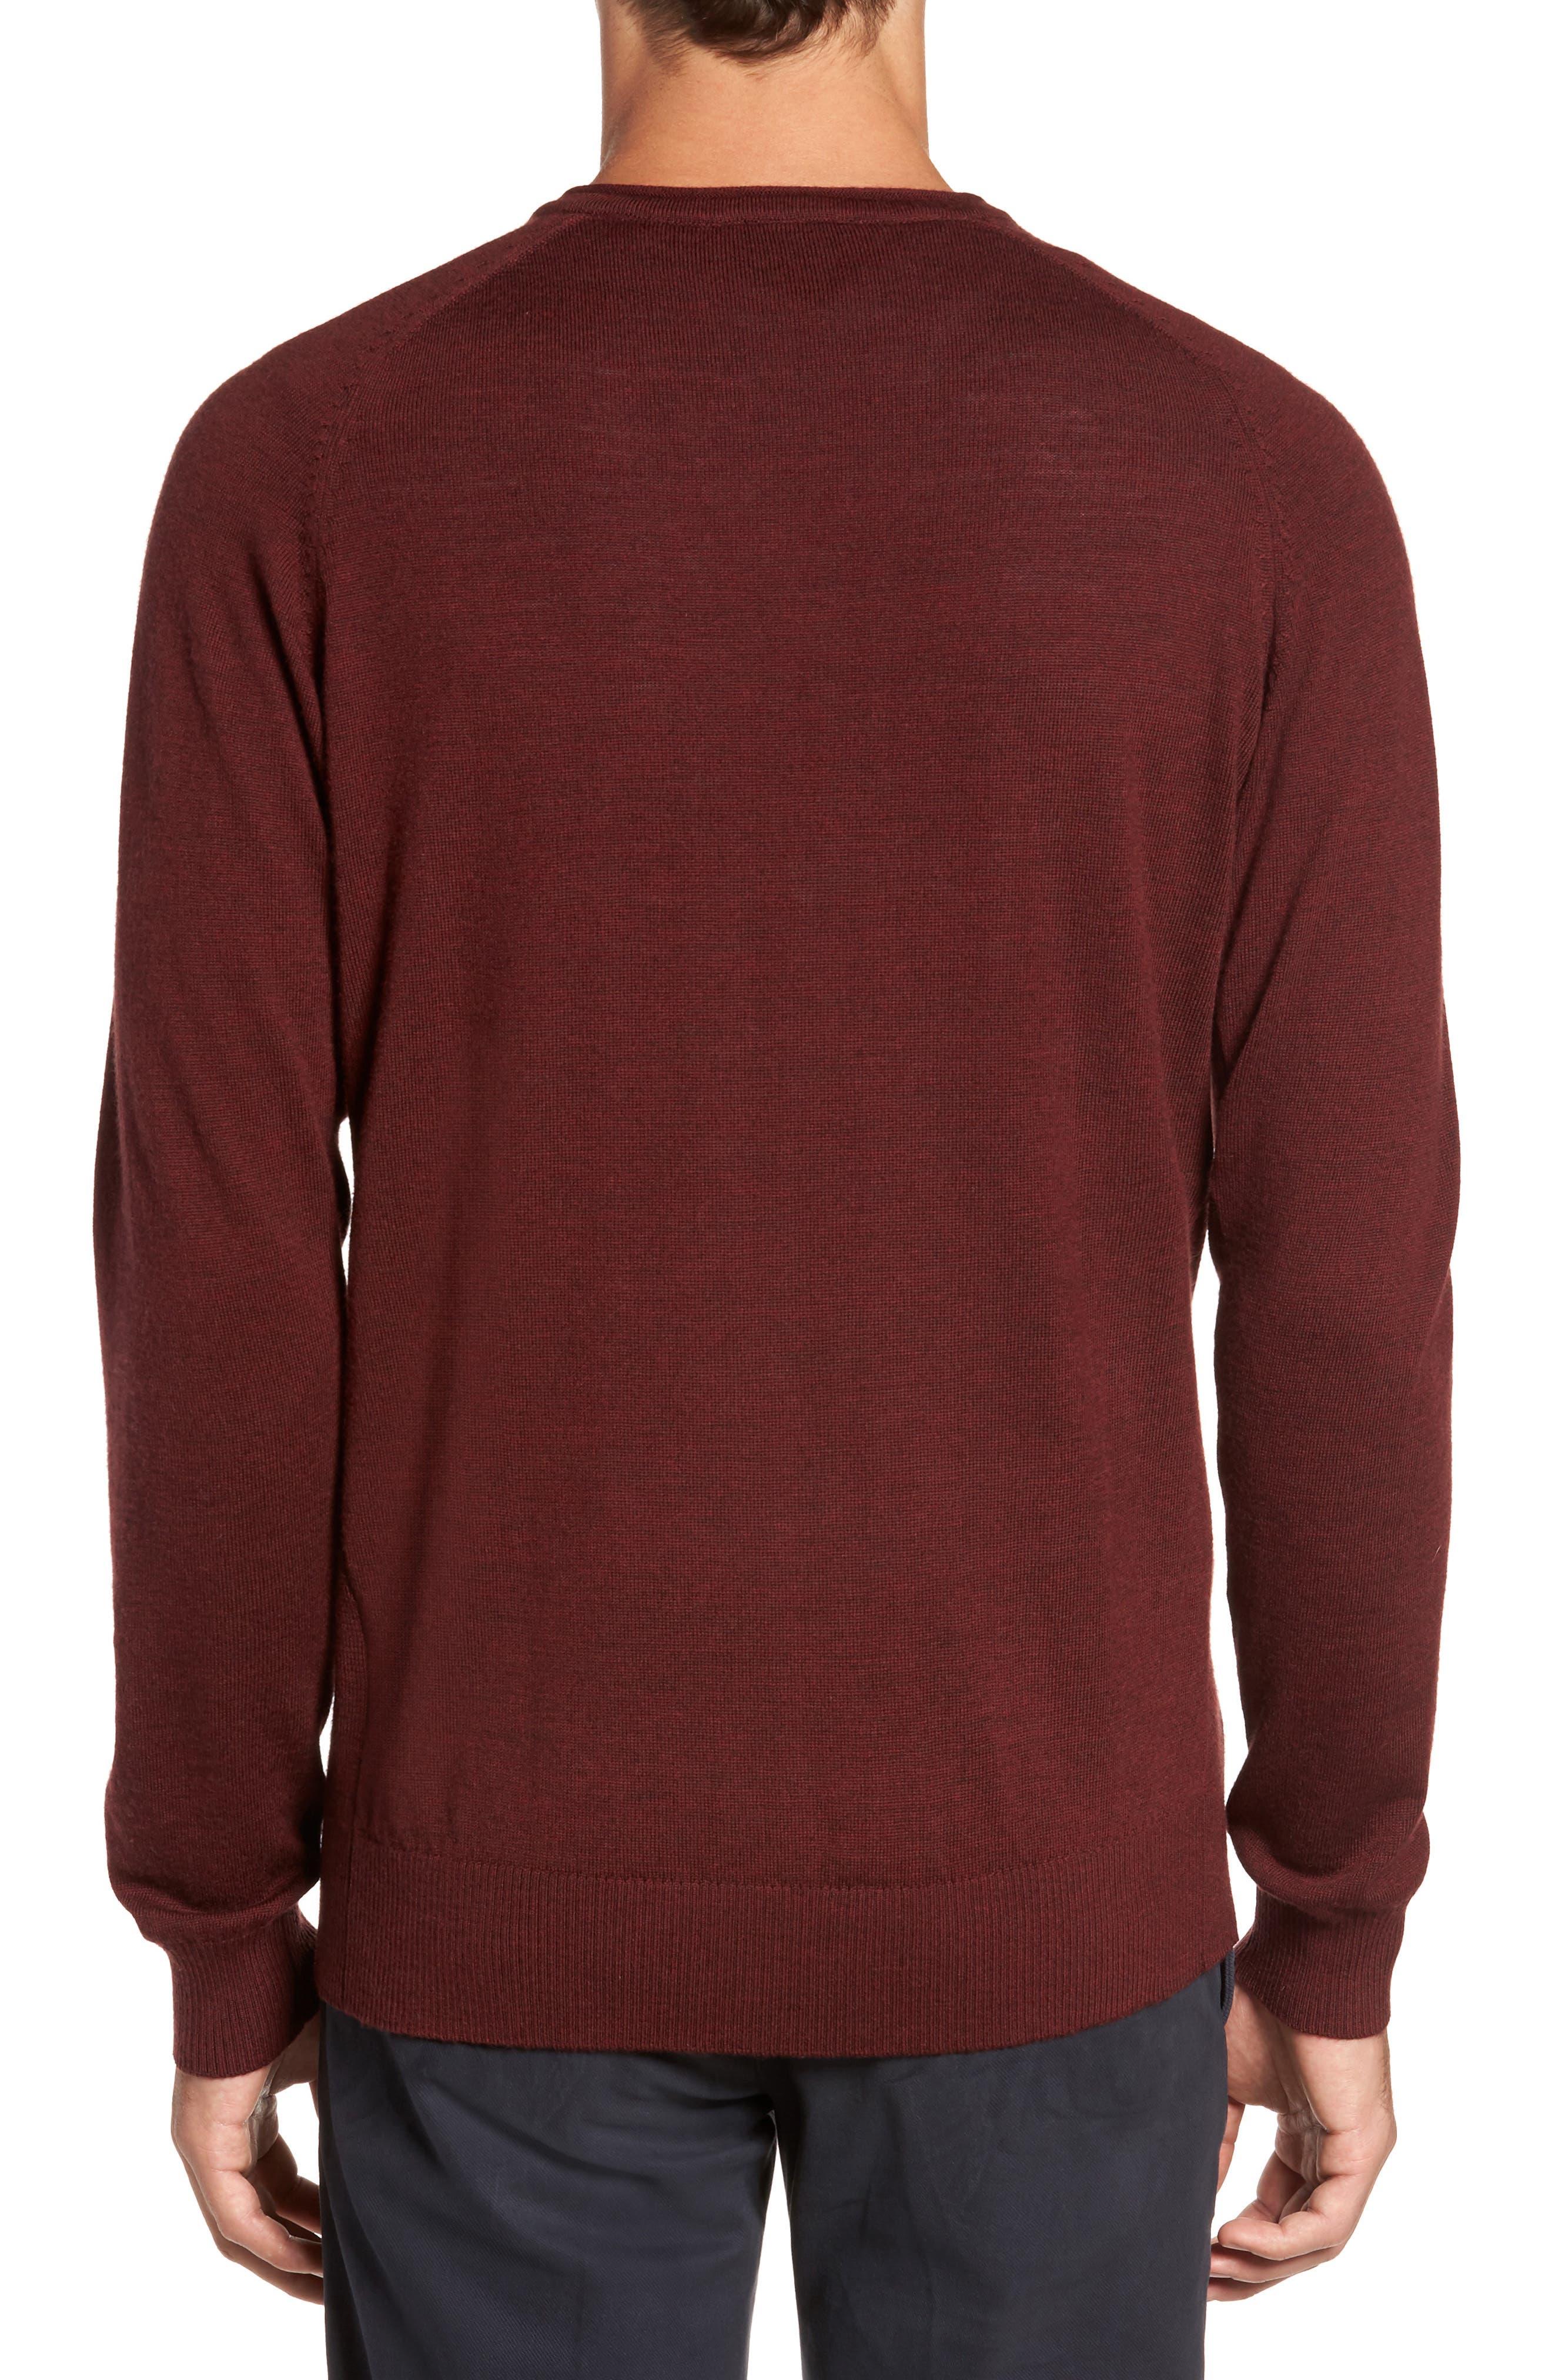 Burfield Wool Sweater,                             Alternate thumbnail 12, color,